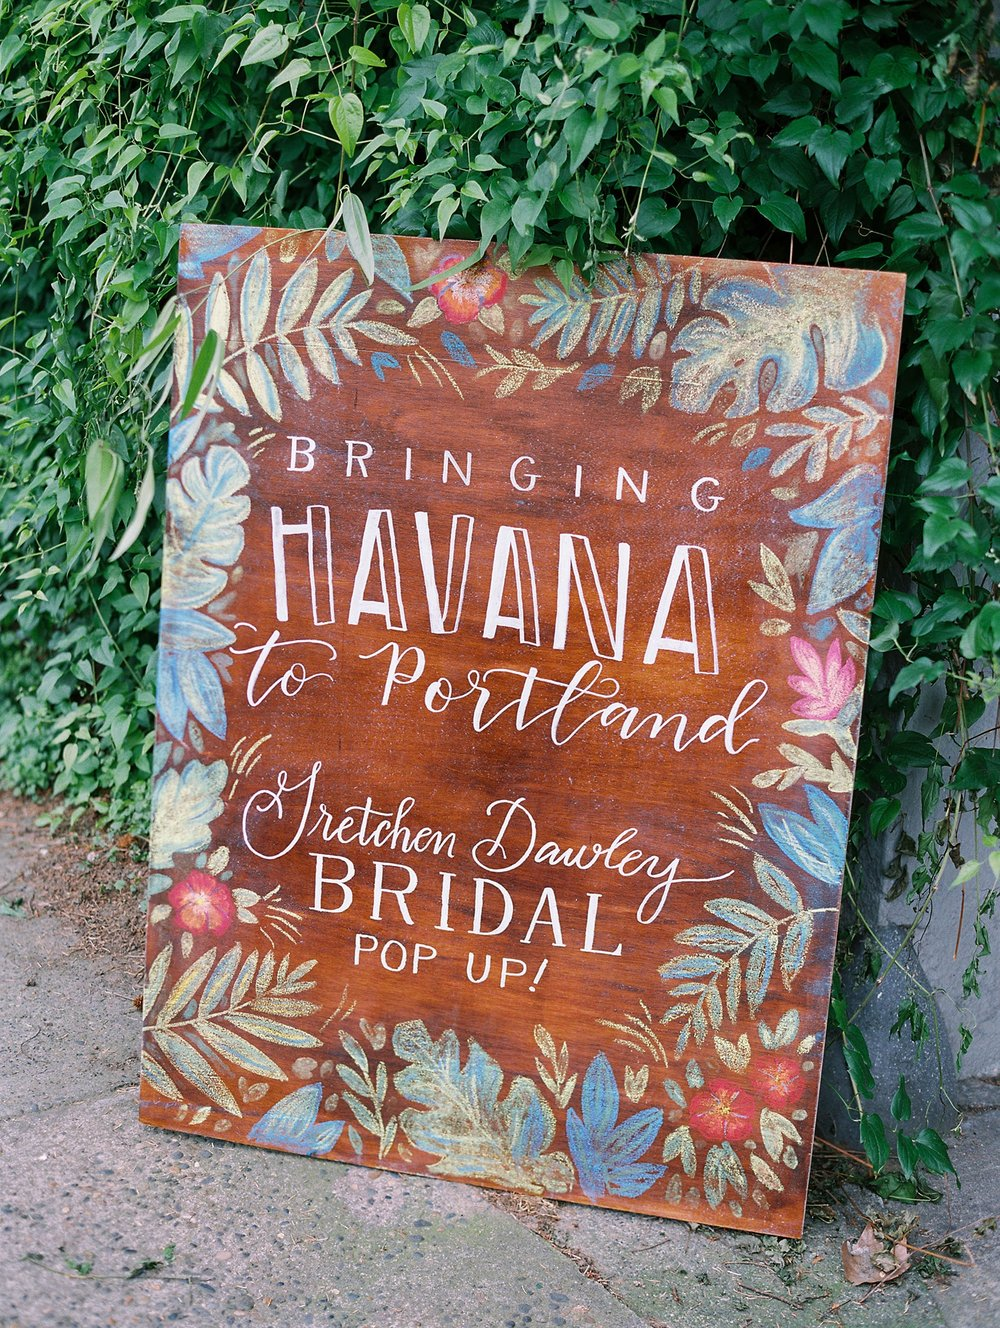 1950s Havana X Portland